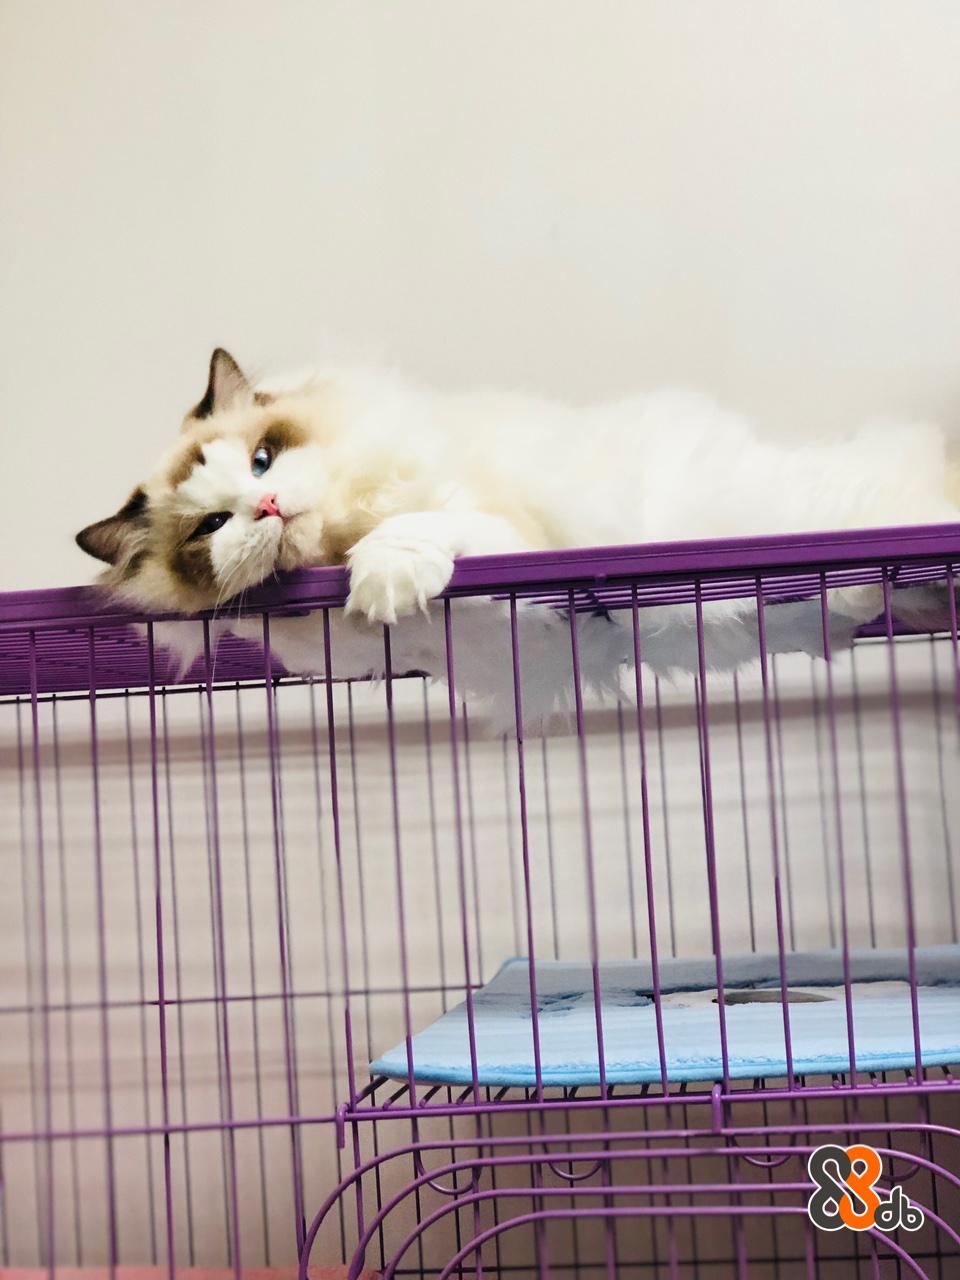 Cat,Felidae,Small to medium-sized cats,Ragdoll,Kitten